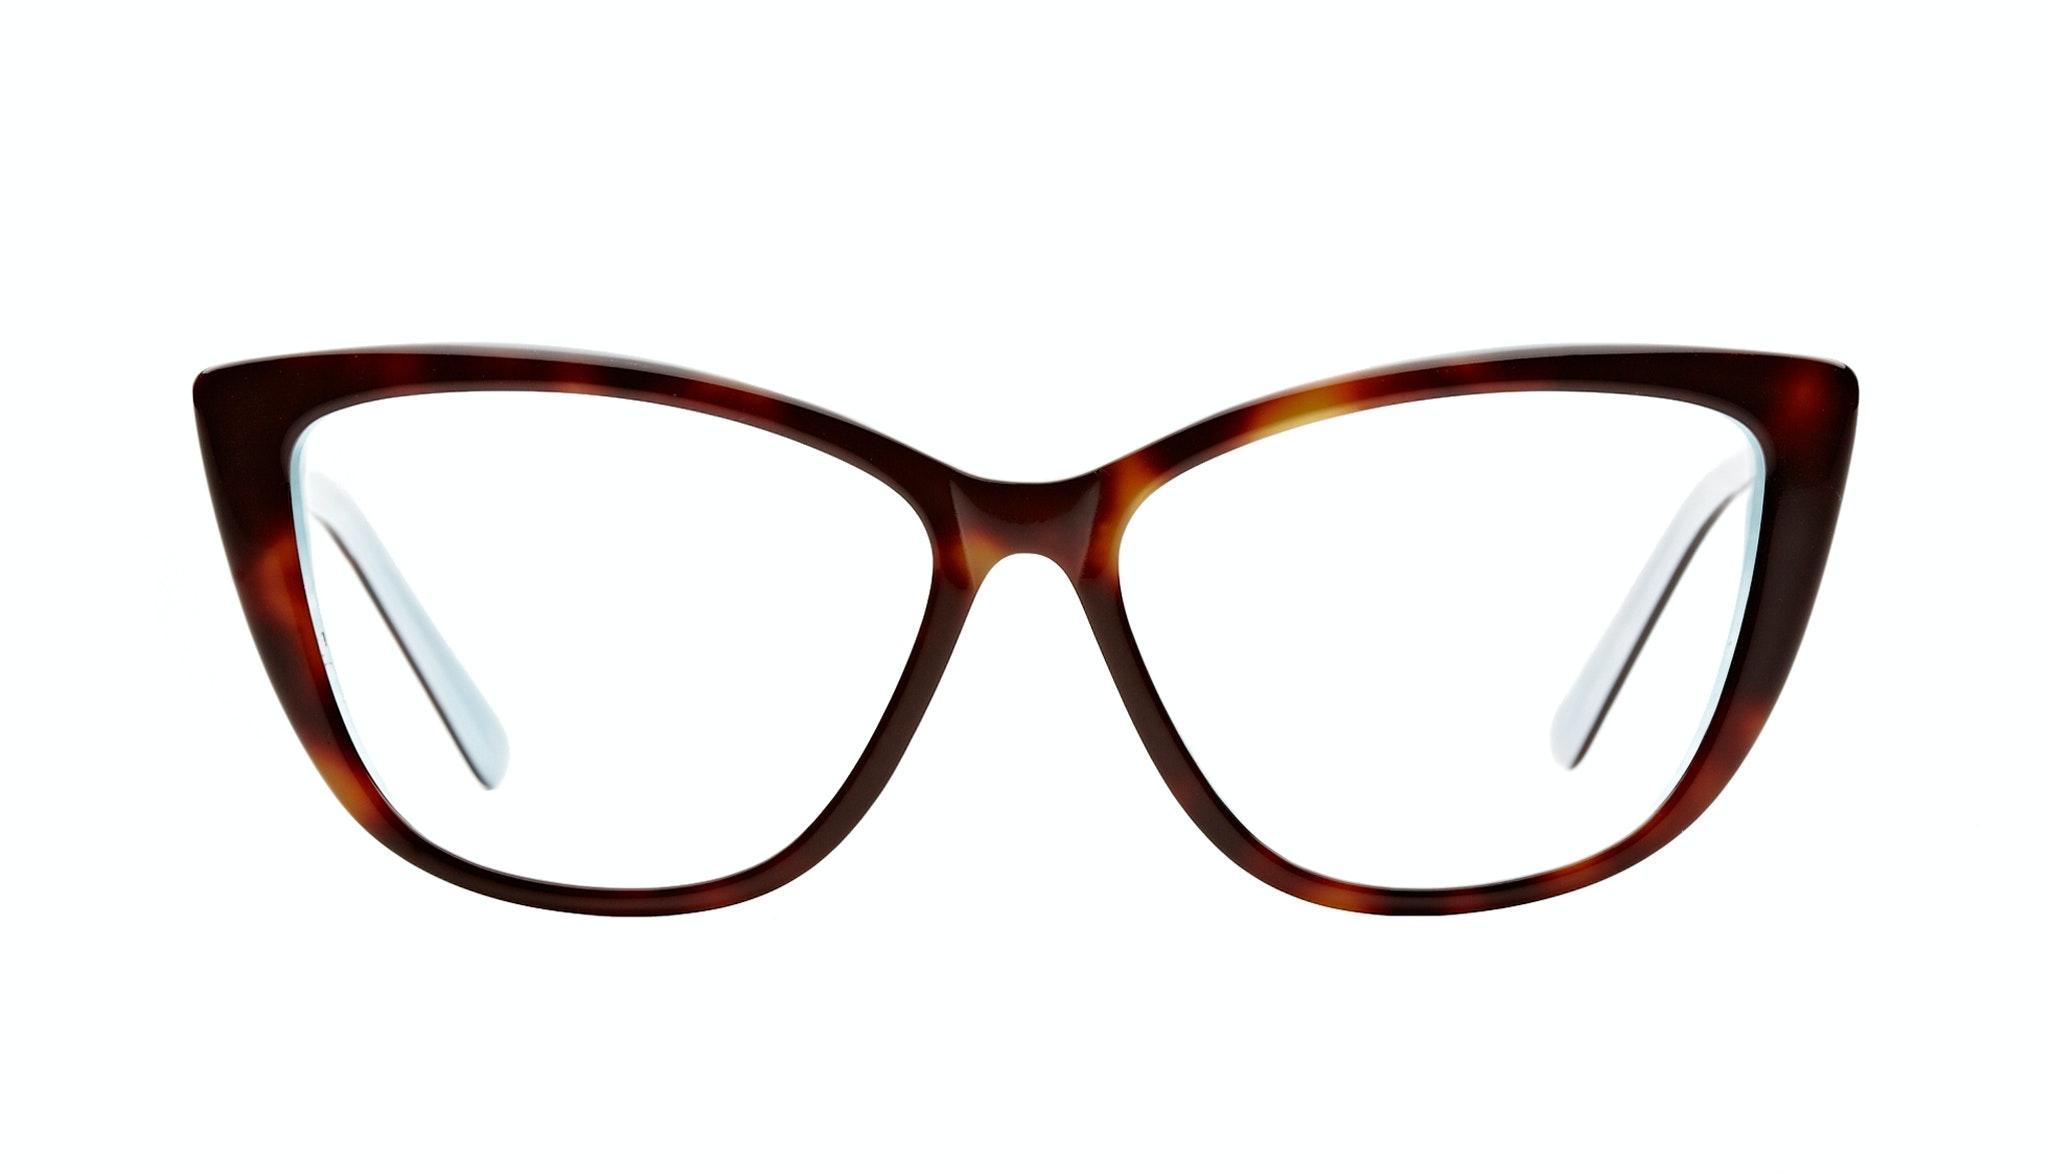 Affordable Fashion Glasses Cat Eye Eyeglasses Women Dolled Up Dreamy Tortoise Front